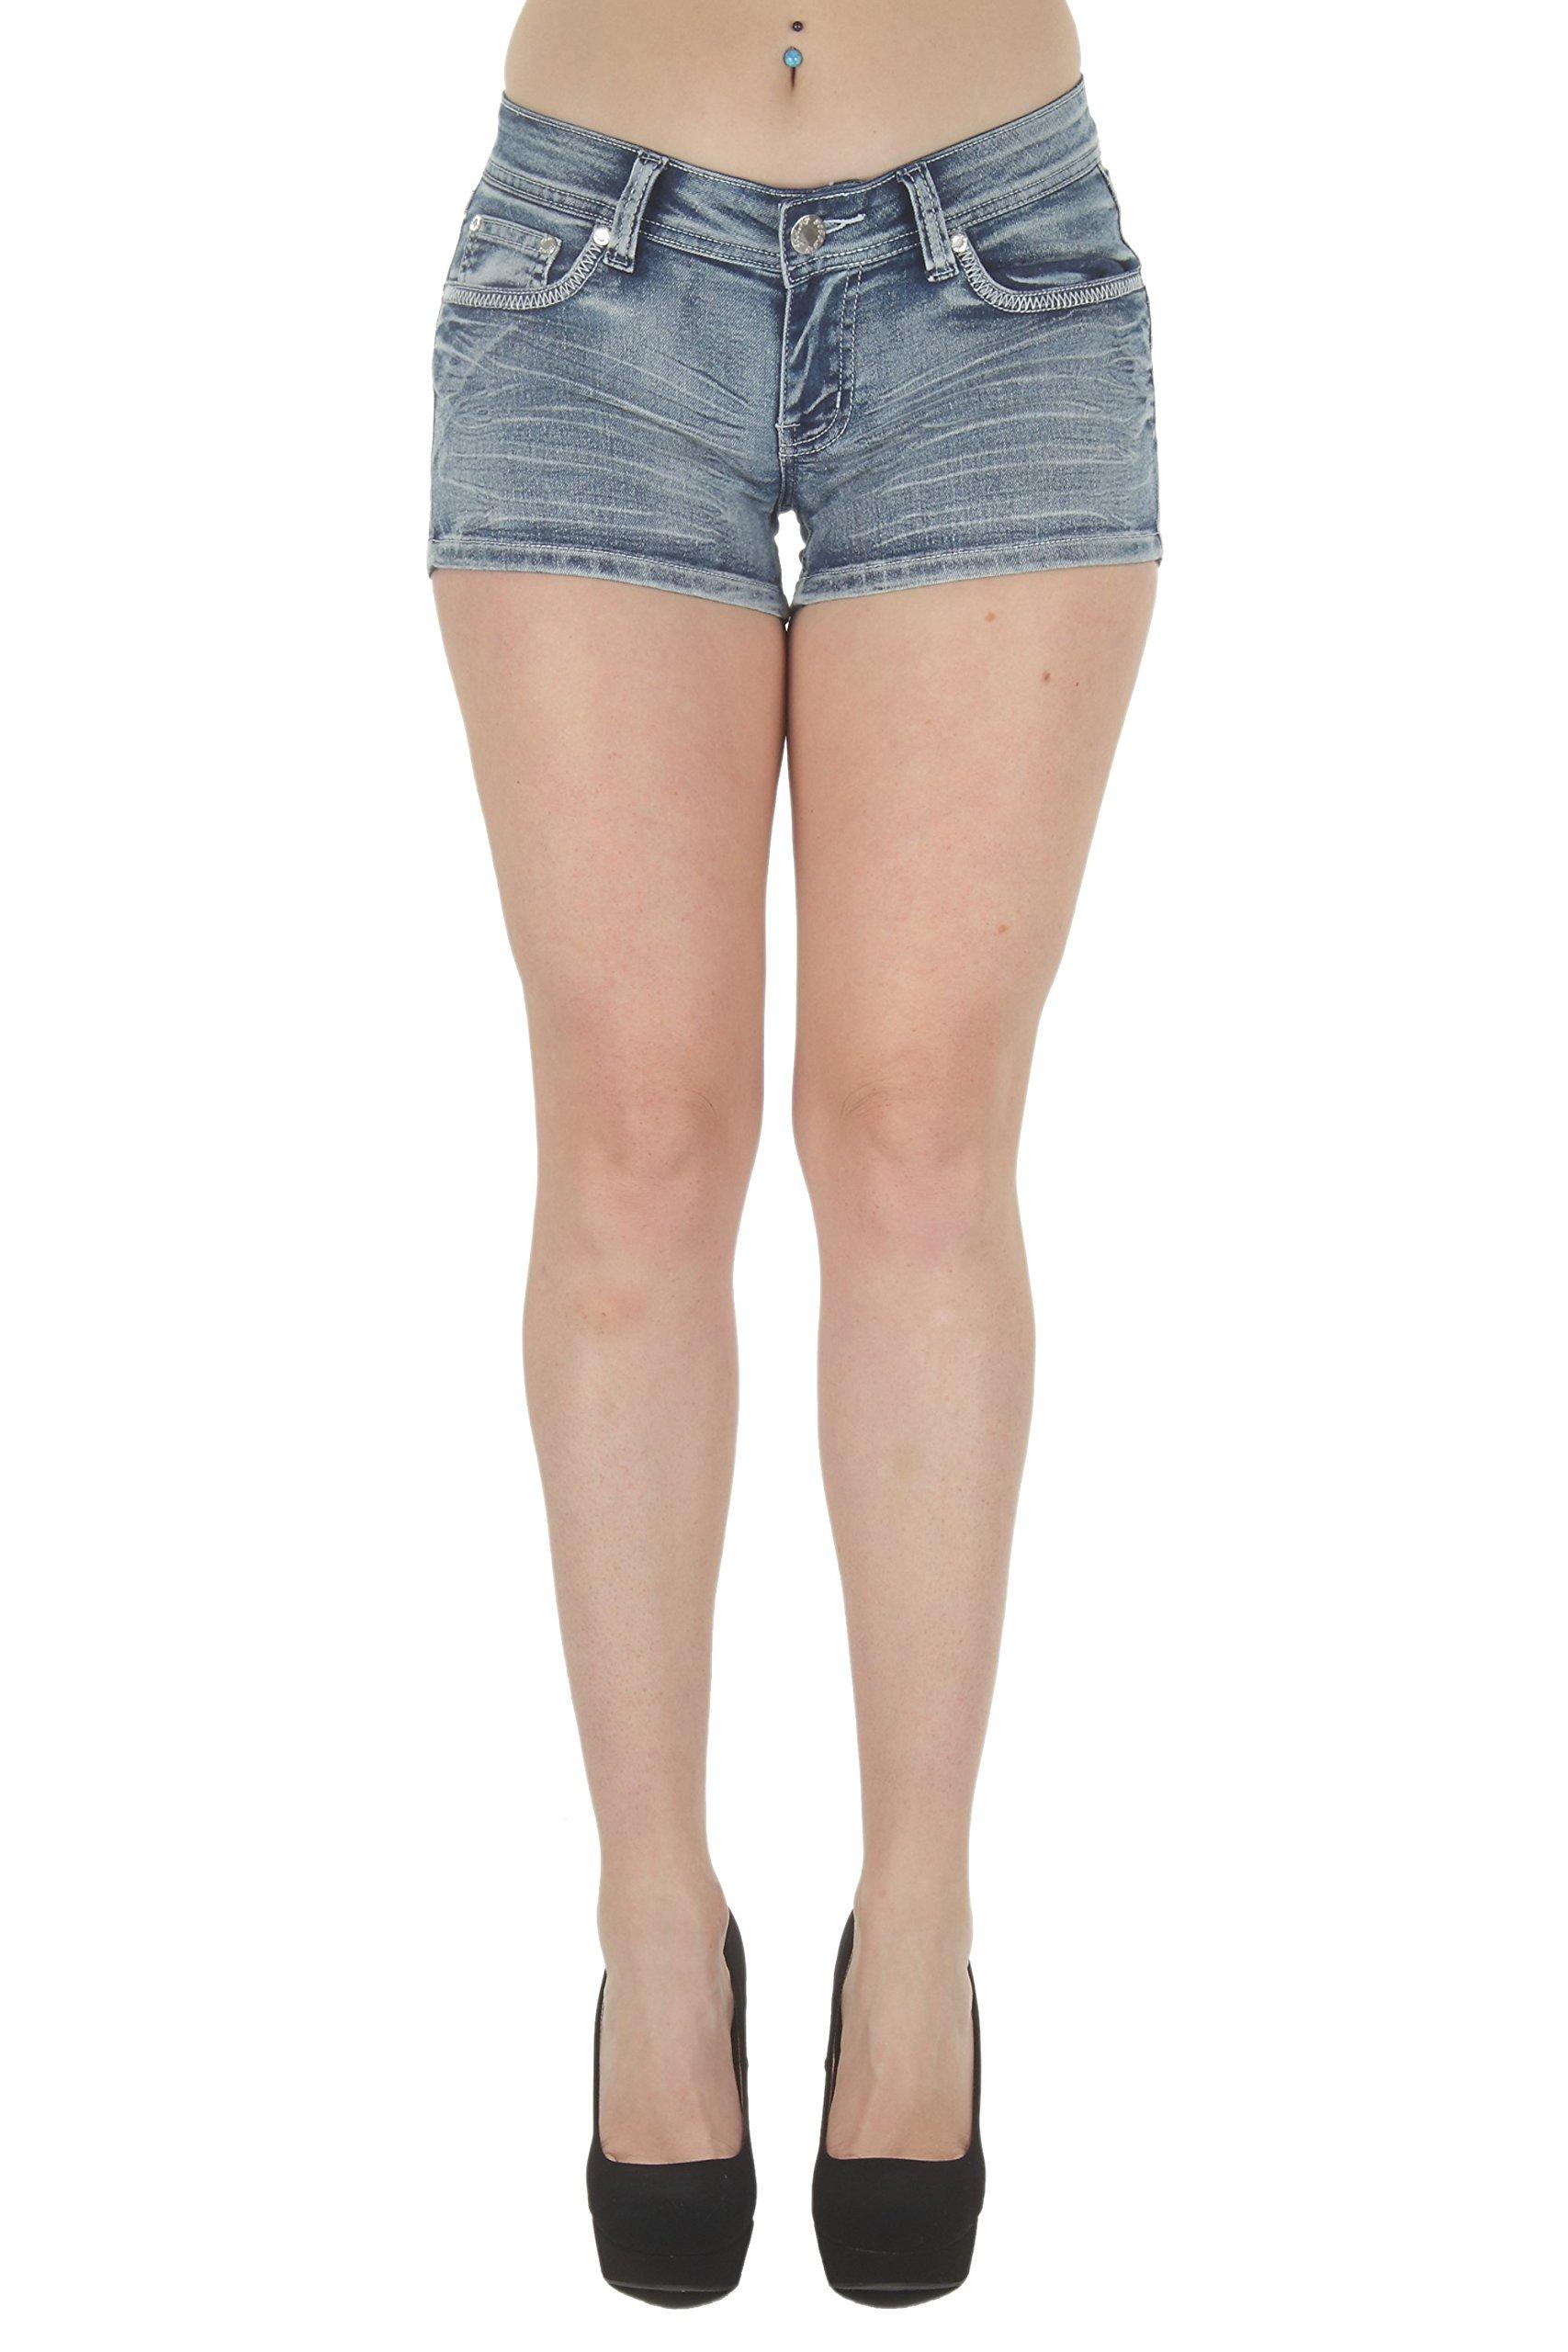 Fashion2Love F2L-35057SH – Colombian Design Butt Lift Levanta Cola, Booty Shorts